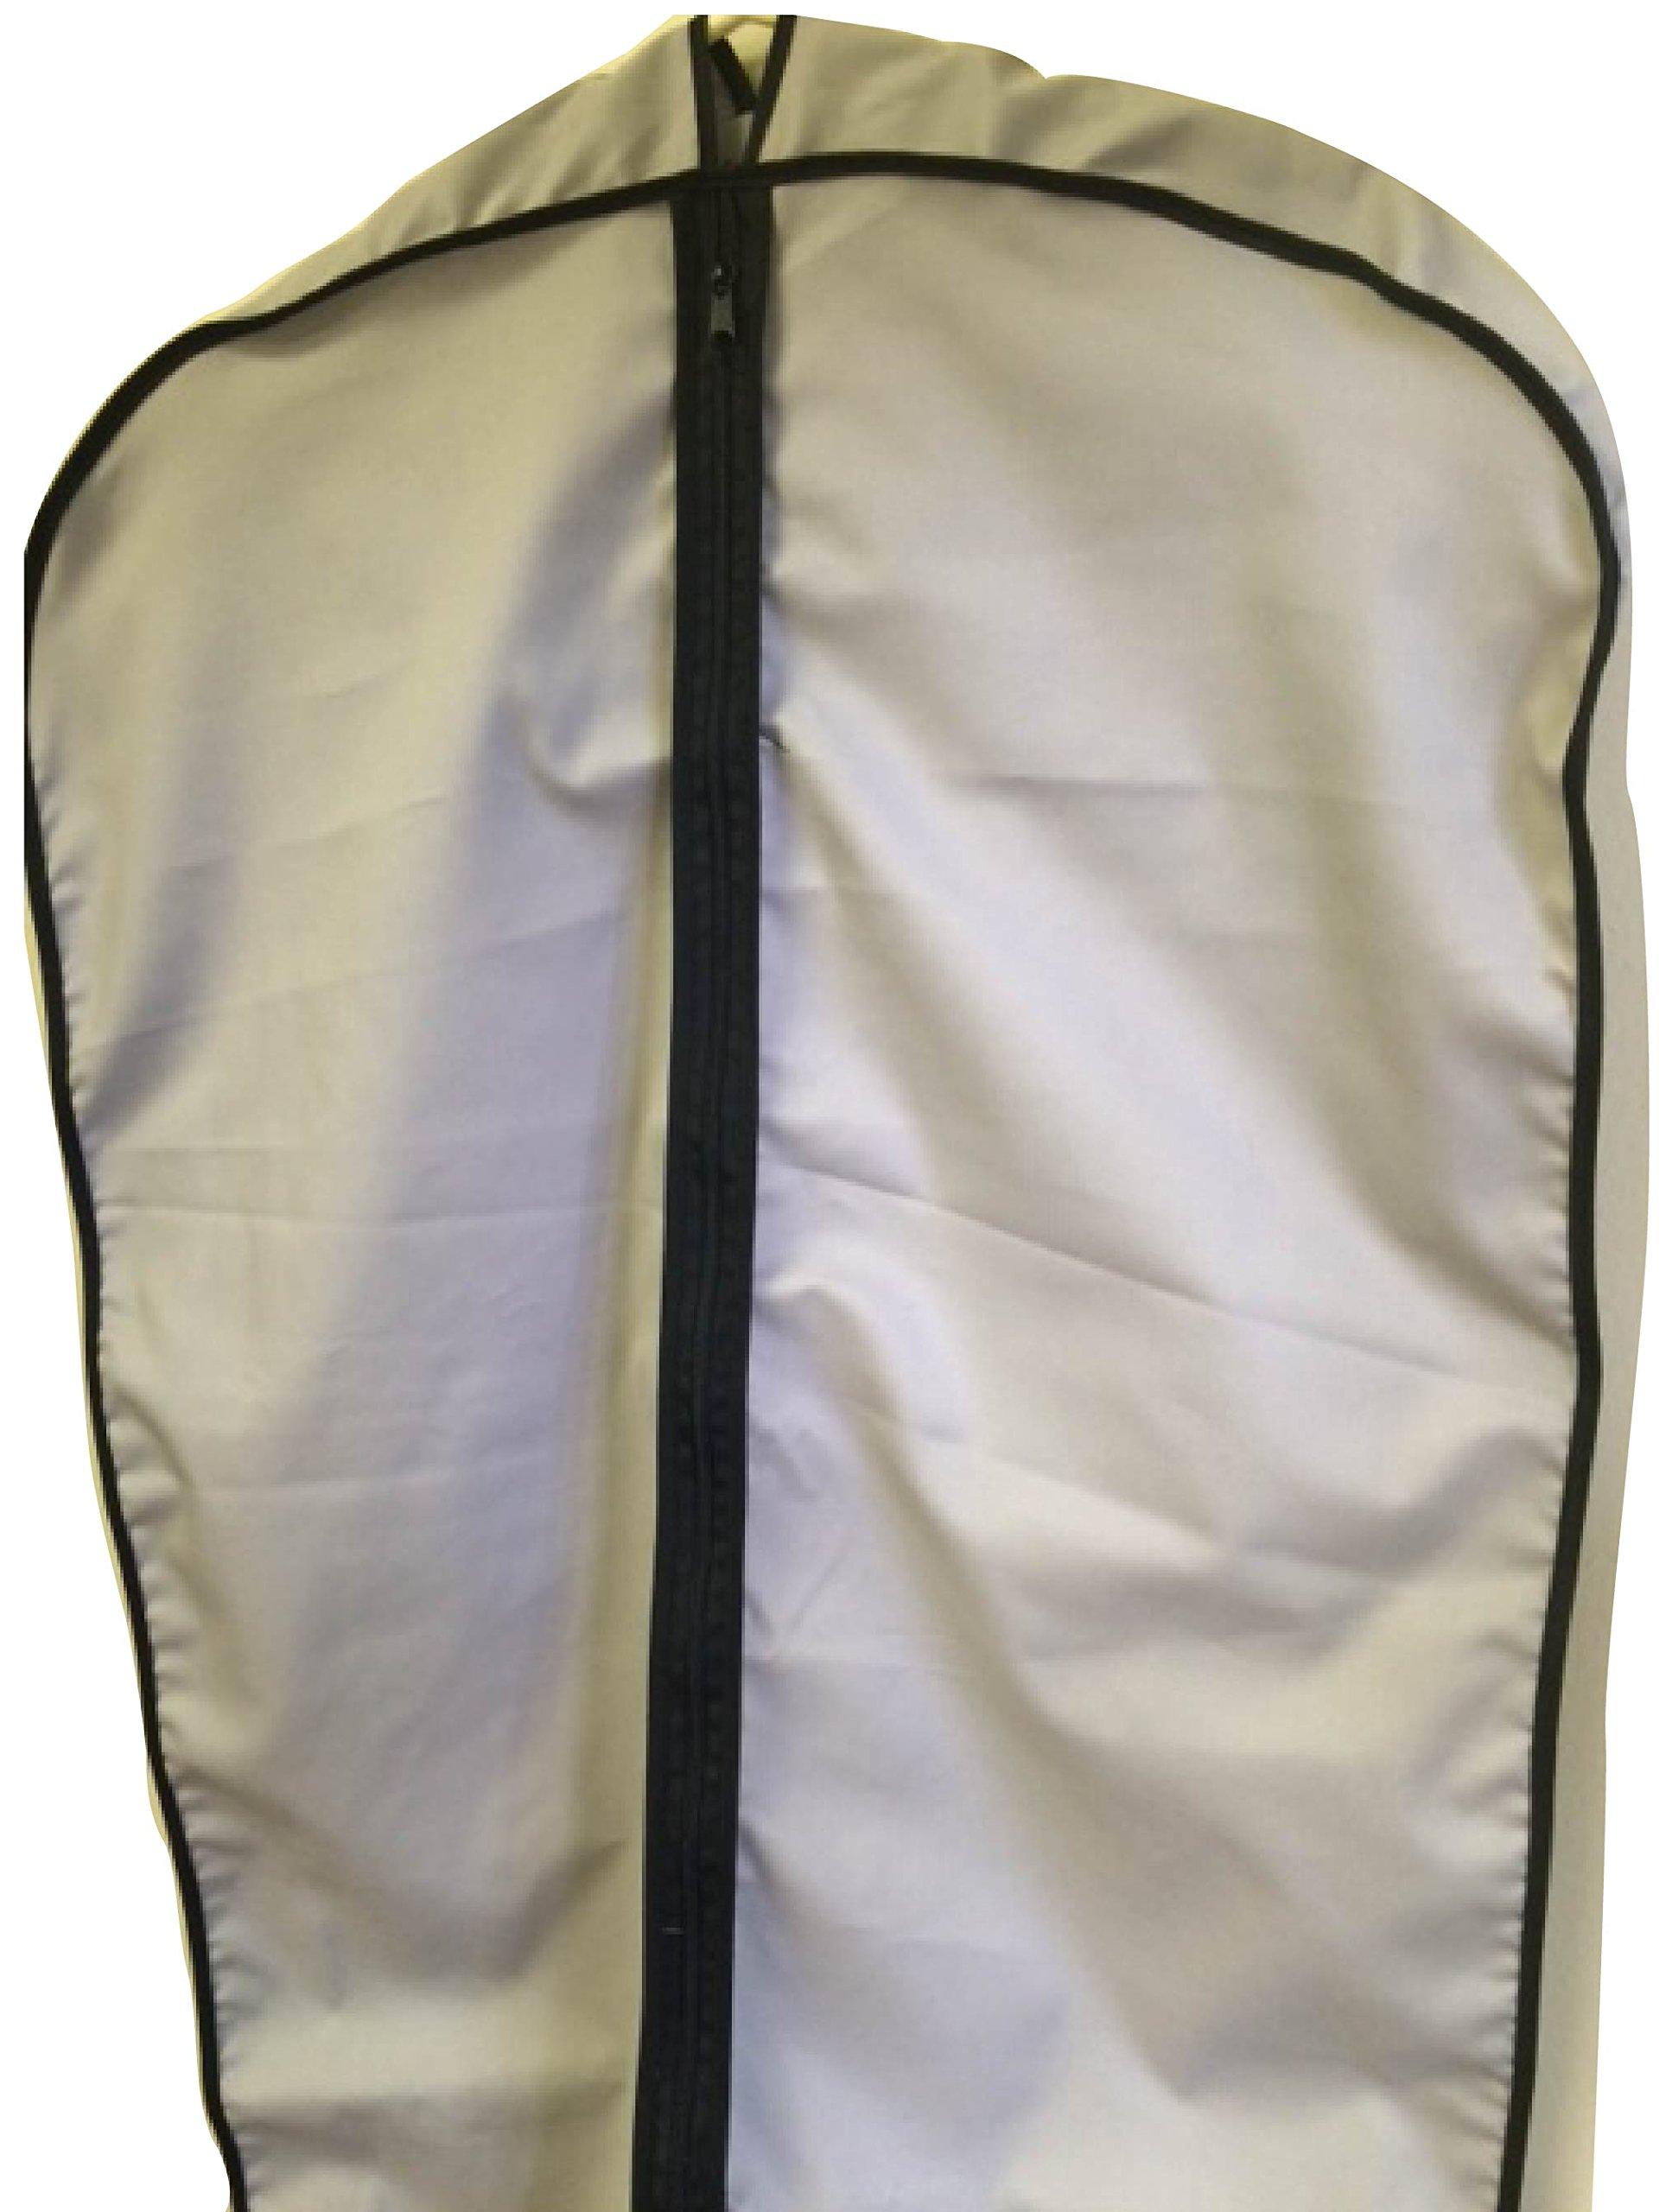 TUVAINC Fabric Garment Bag, Grey Cotton, 45''